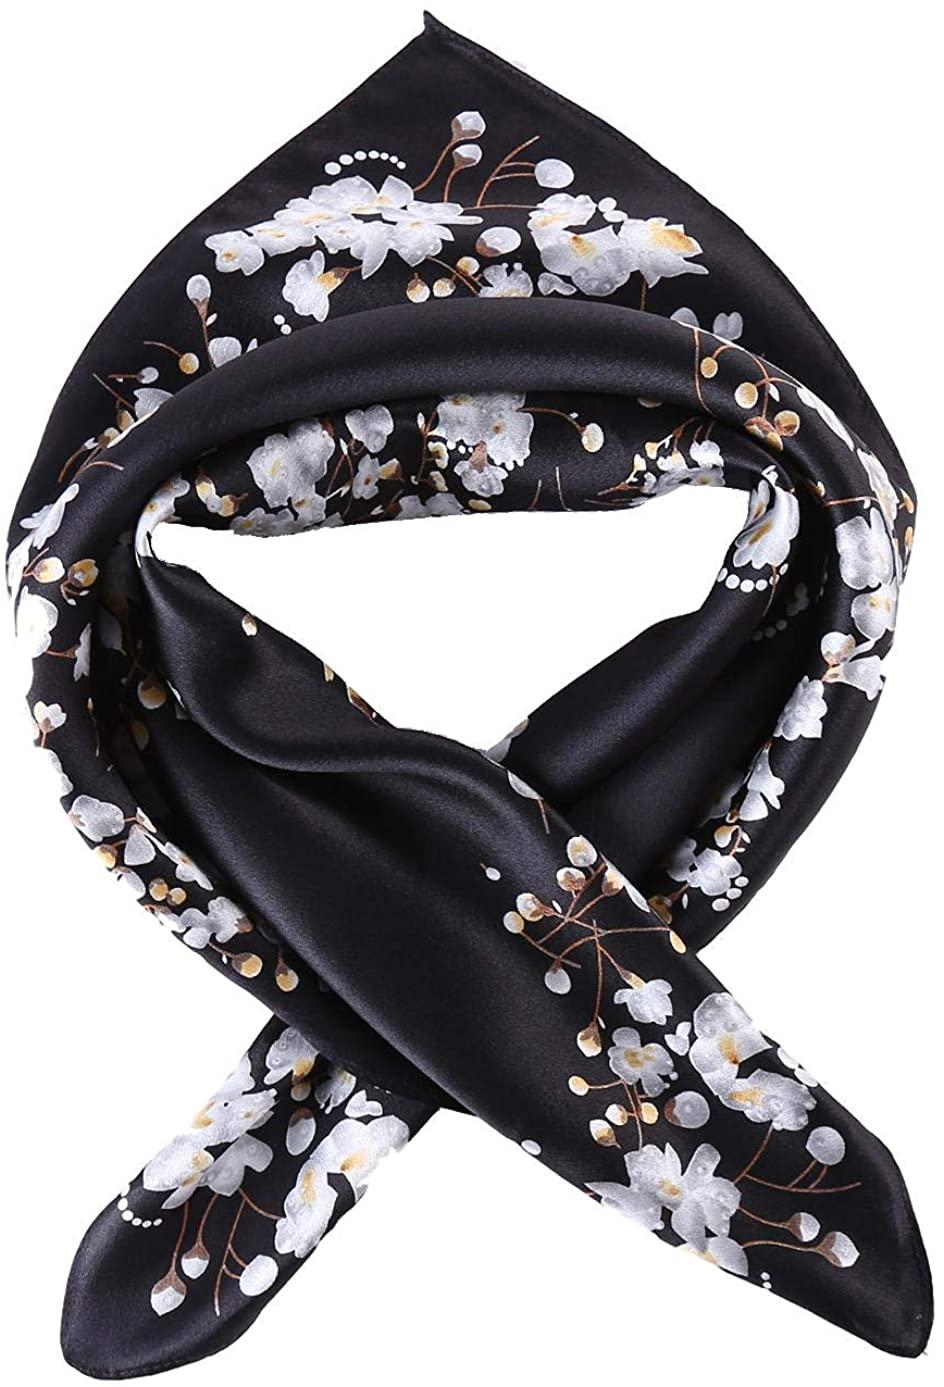 JWSilk Women's 100% Silk Neckerchief Small Square Silk Scarf